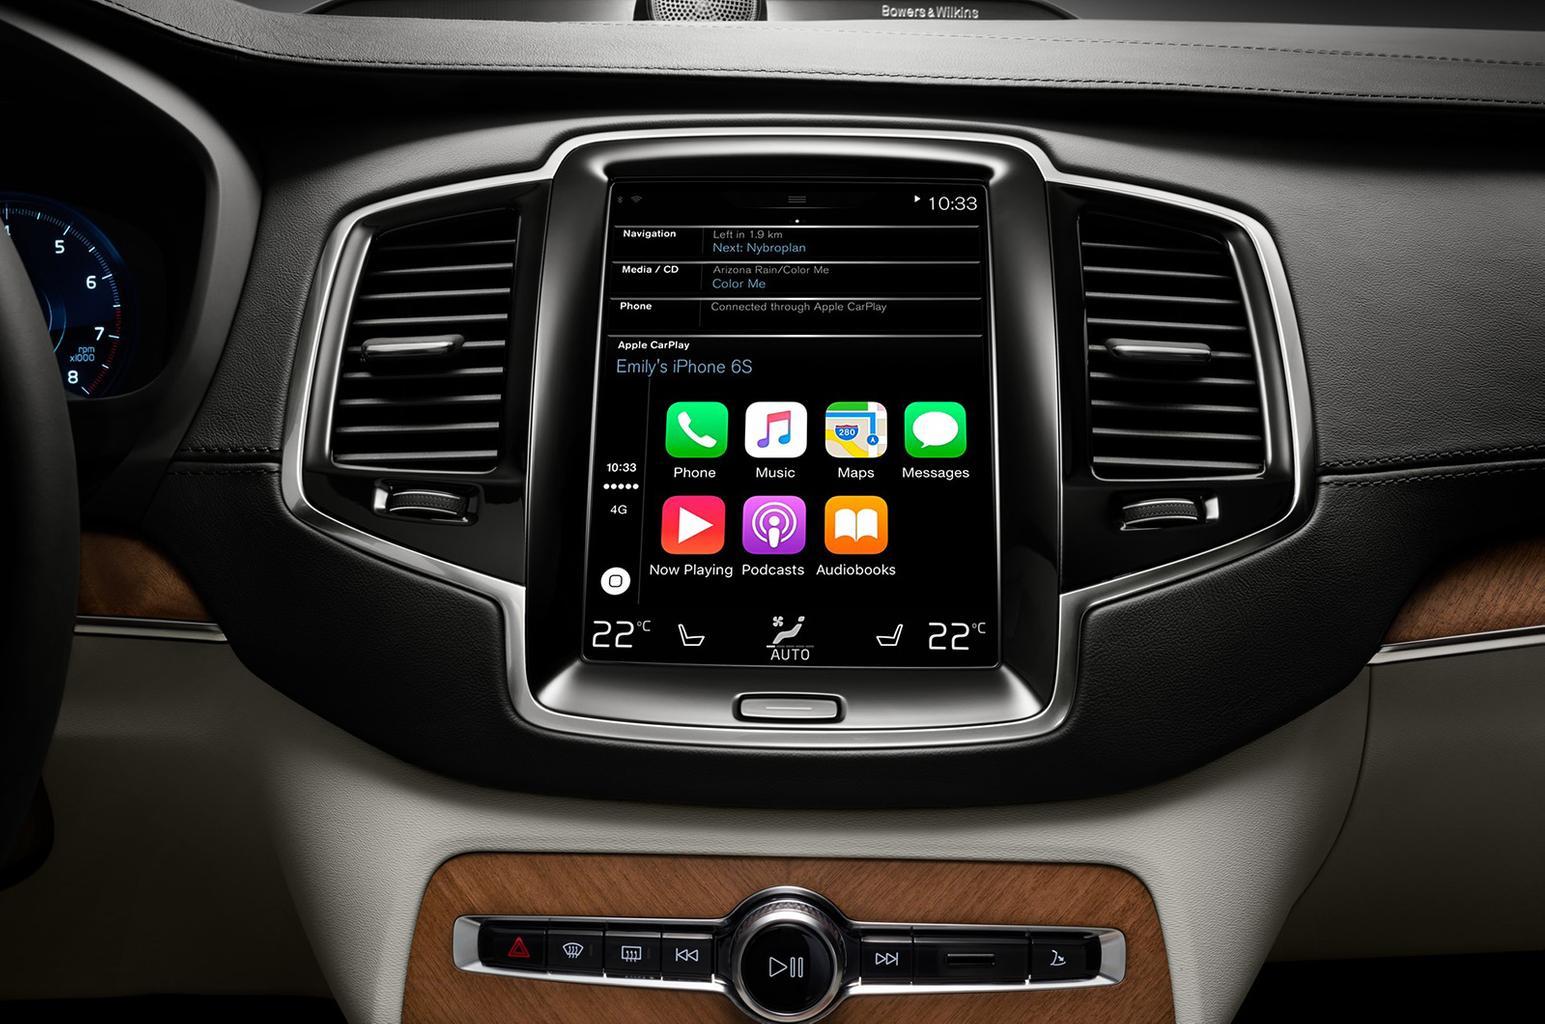 What is Apple CarPlay?